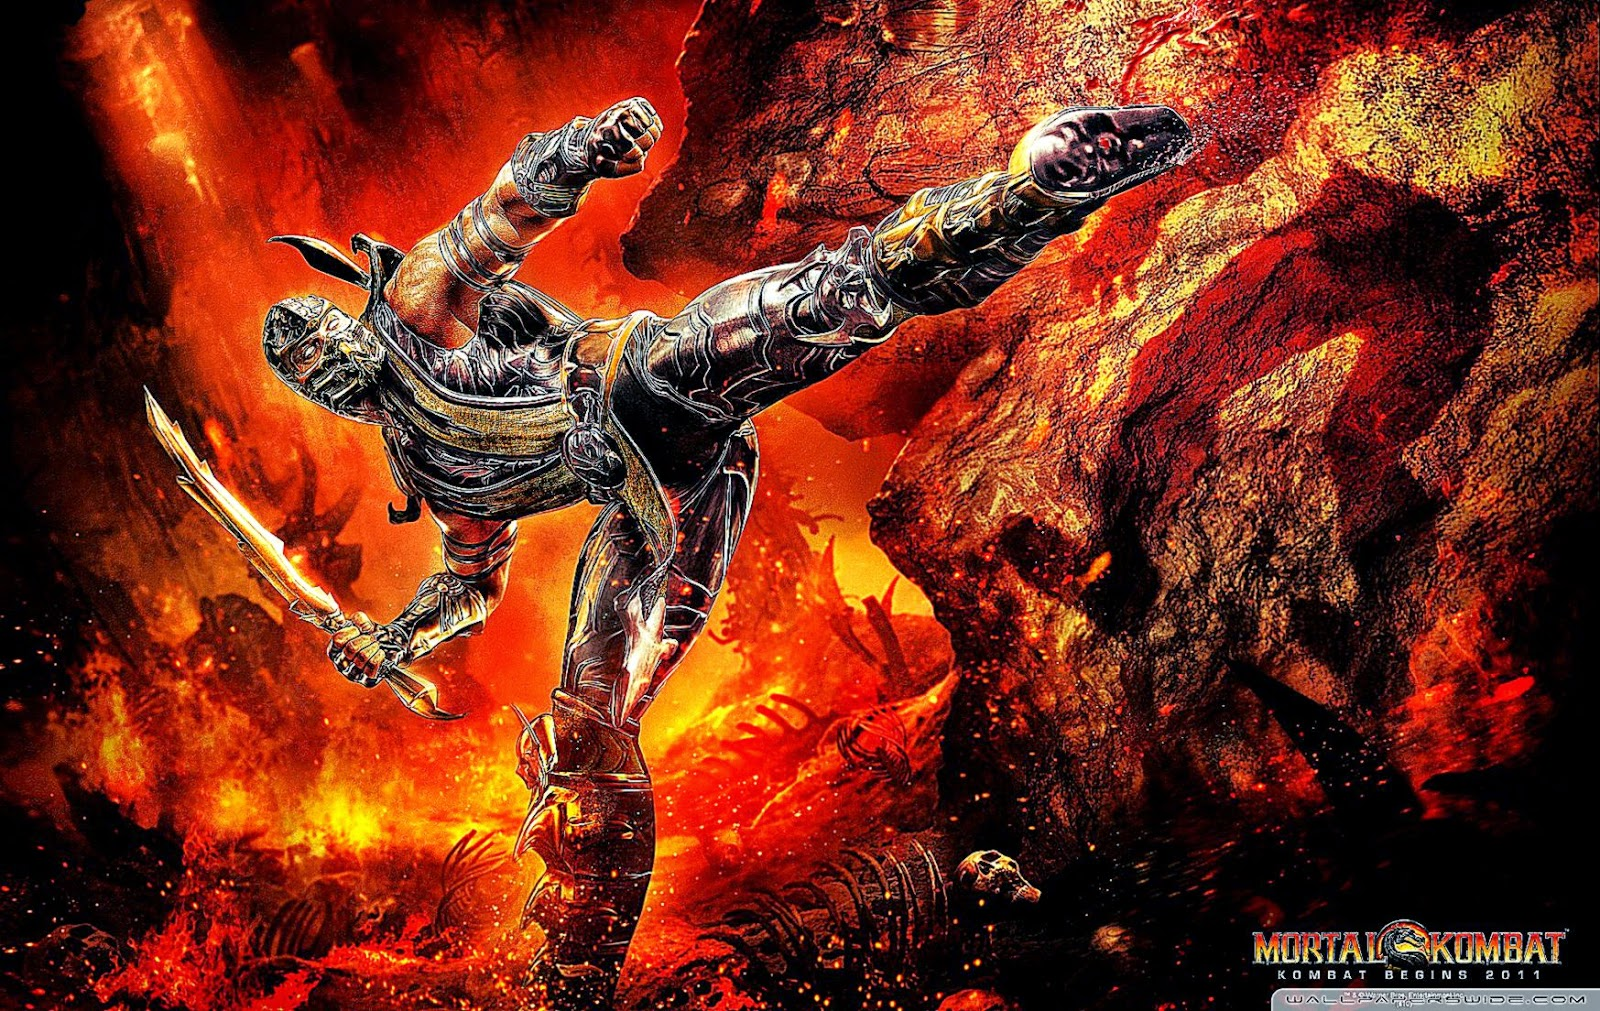 Mortal Kombat Scorpion Wallpaper Cool HD Wallpapers 1600x1011